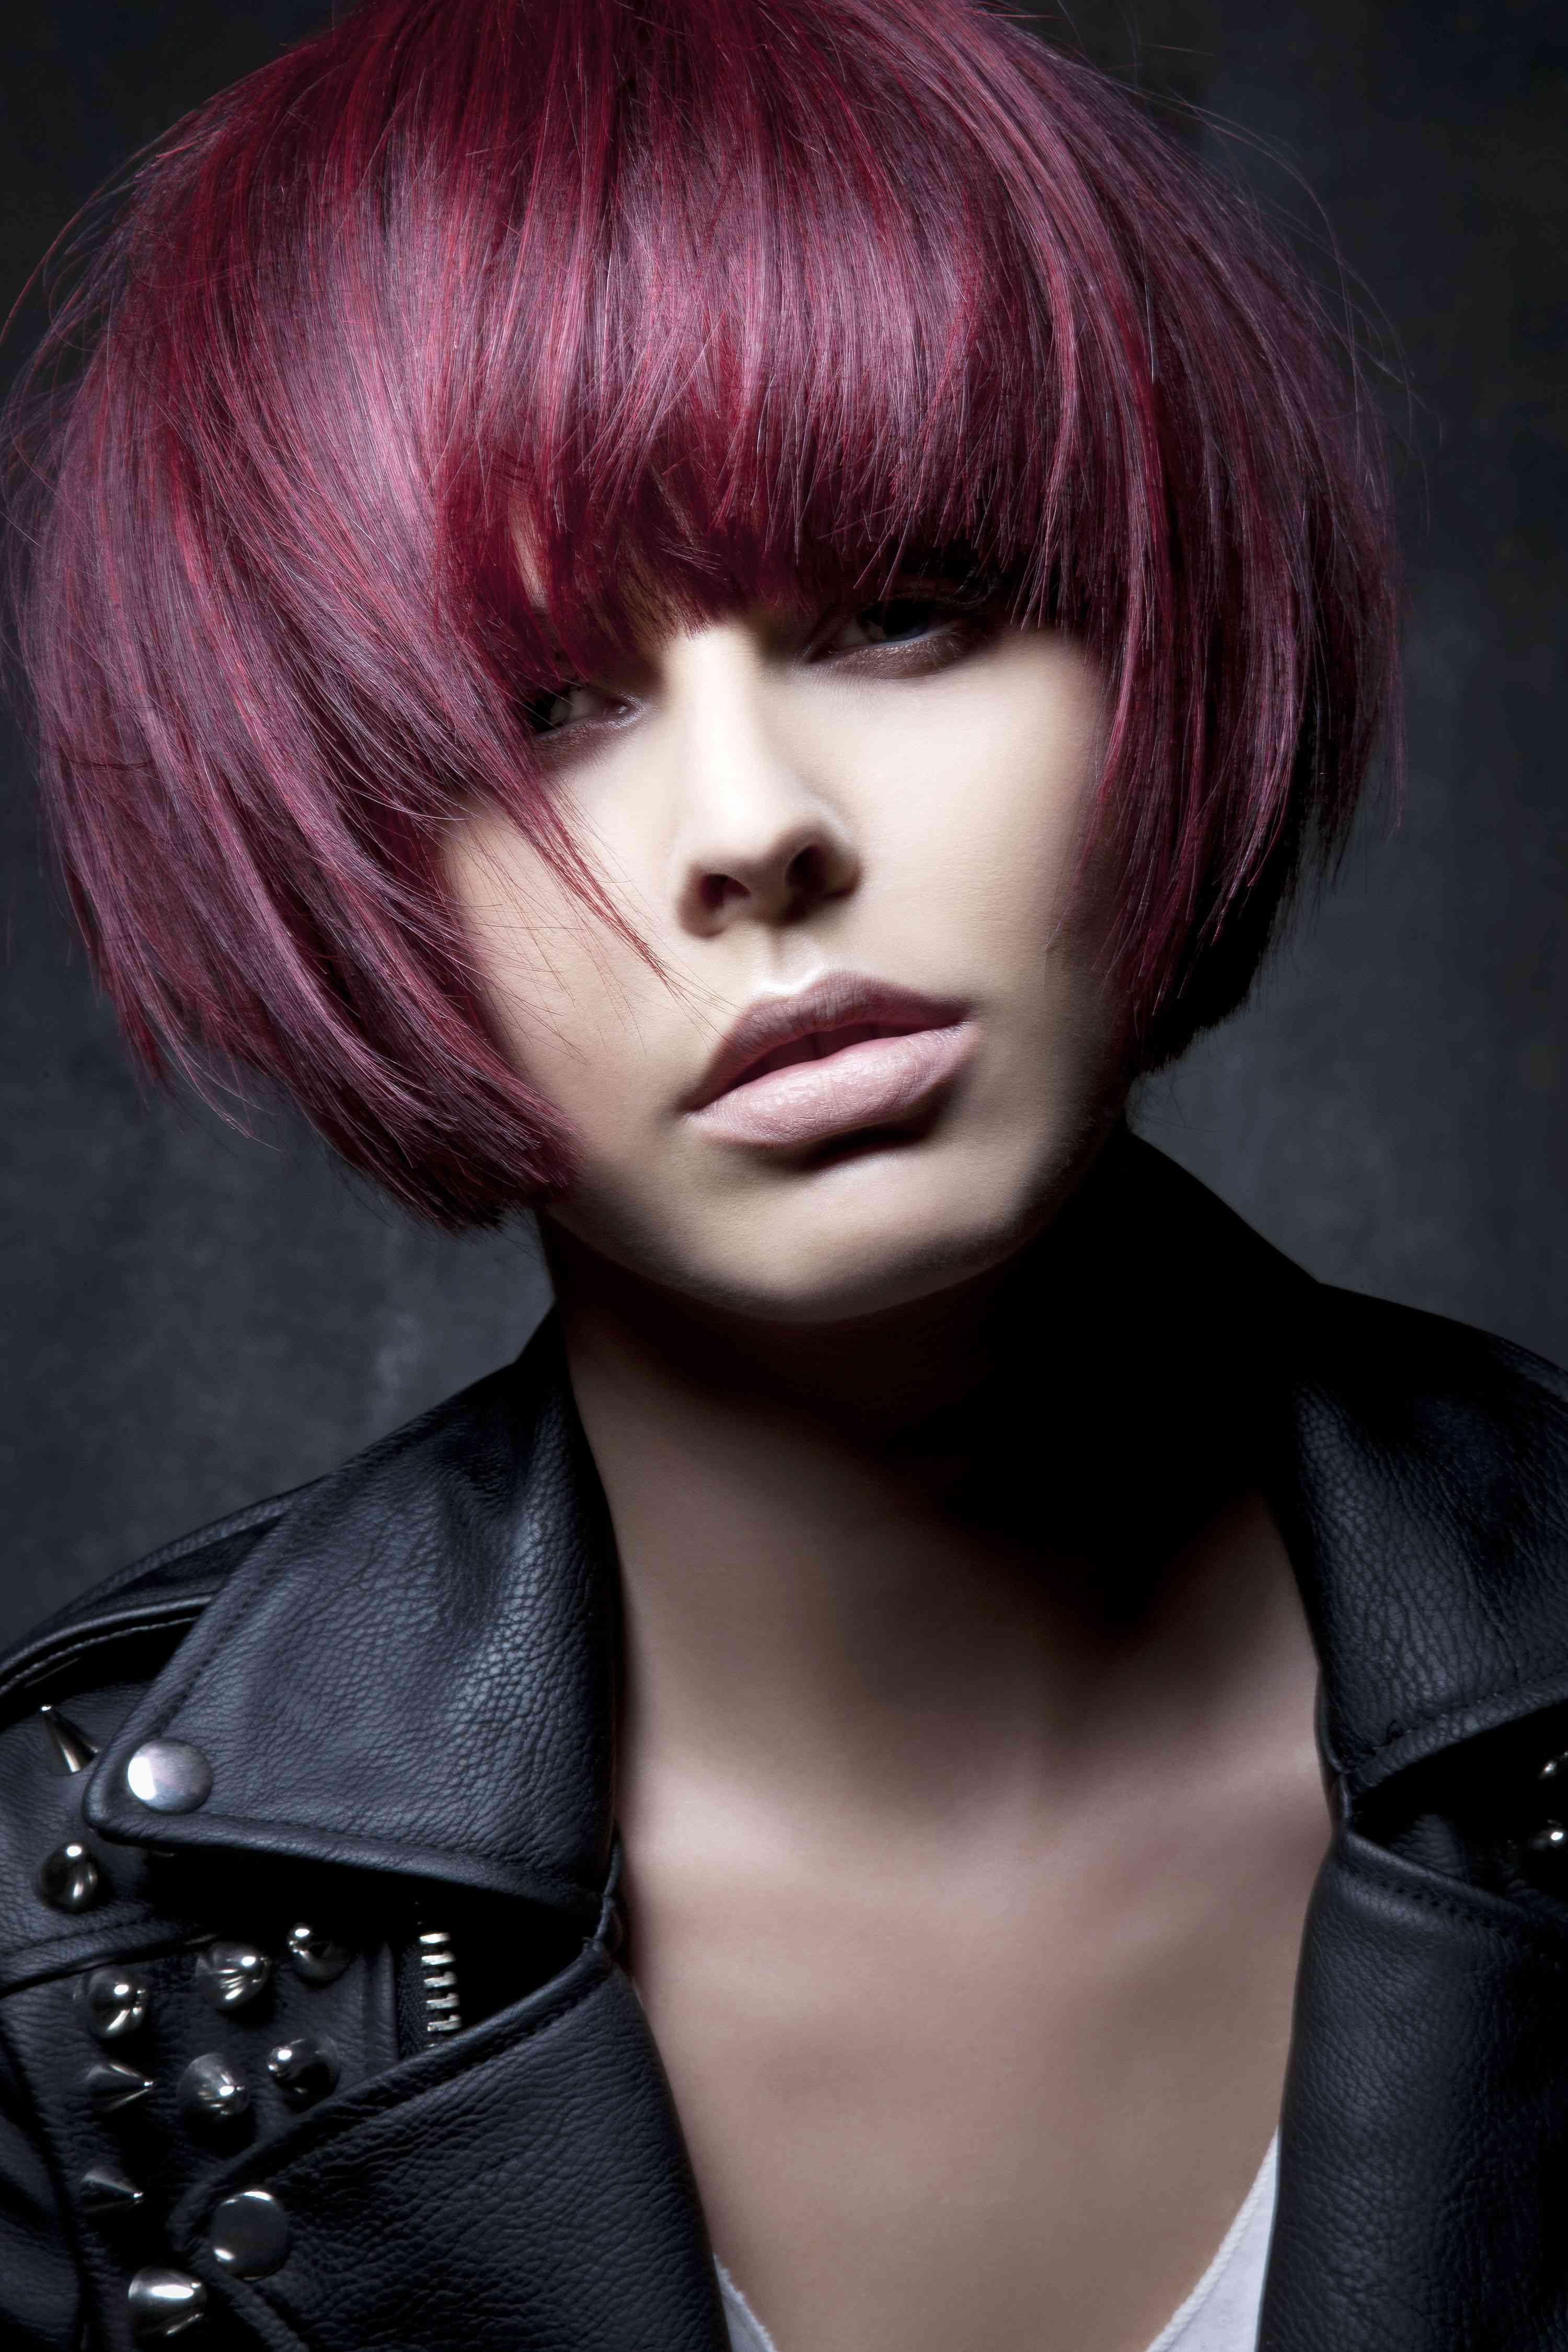 hair salons regis  YouTube